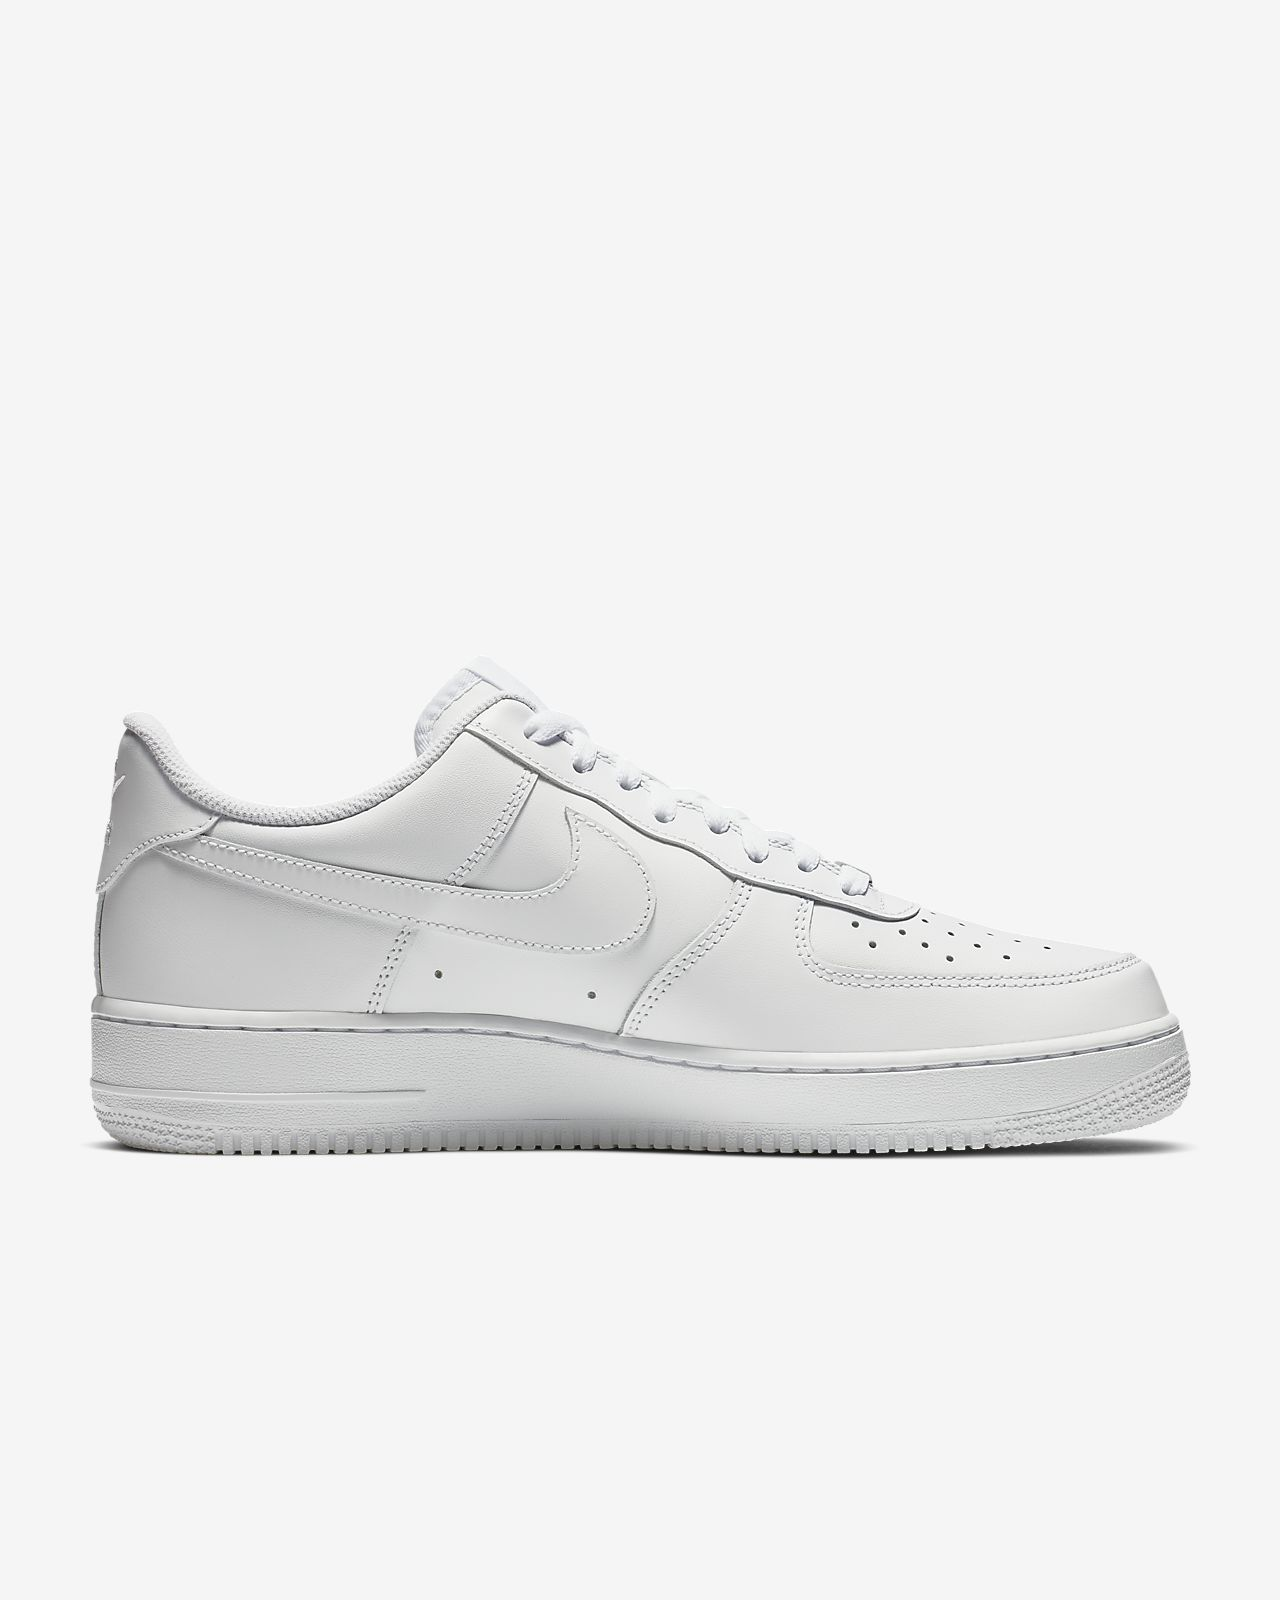 Calzado para hombre Nike Air Force 1 '07 Triple White